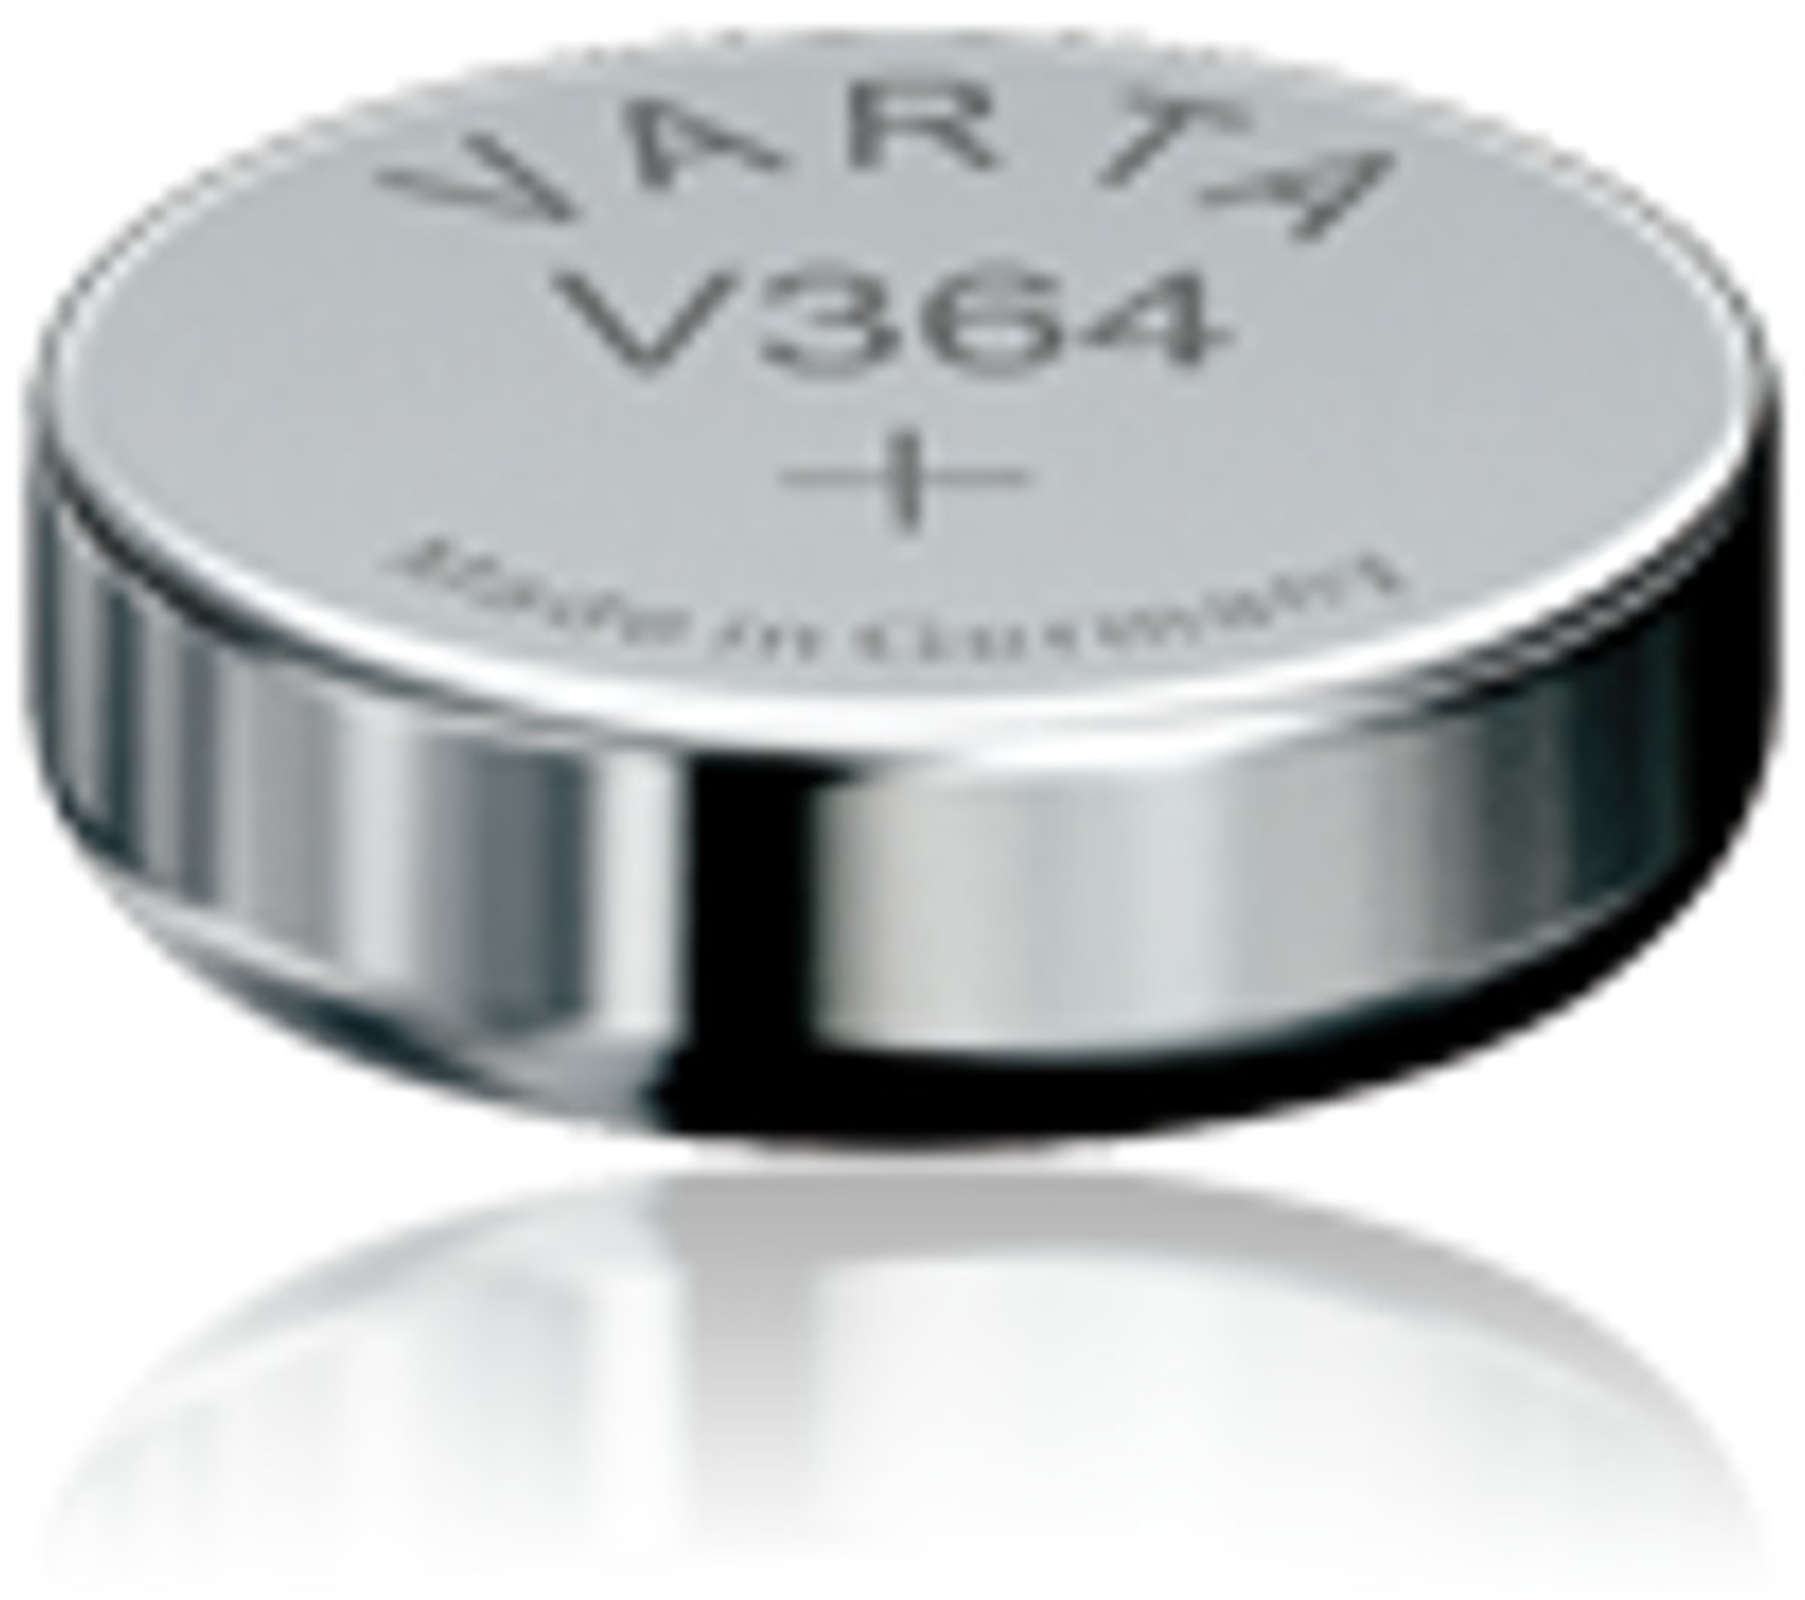 10x Varta Watch V 364 Uhrenzelle Knopfzelle Uhrenbatterie SR621 SW ...